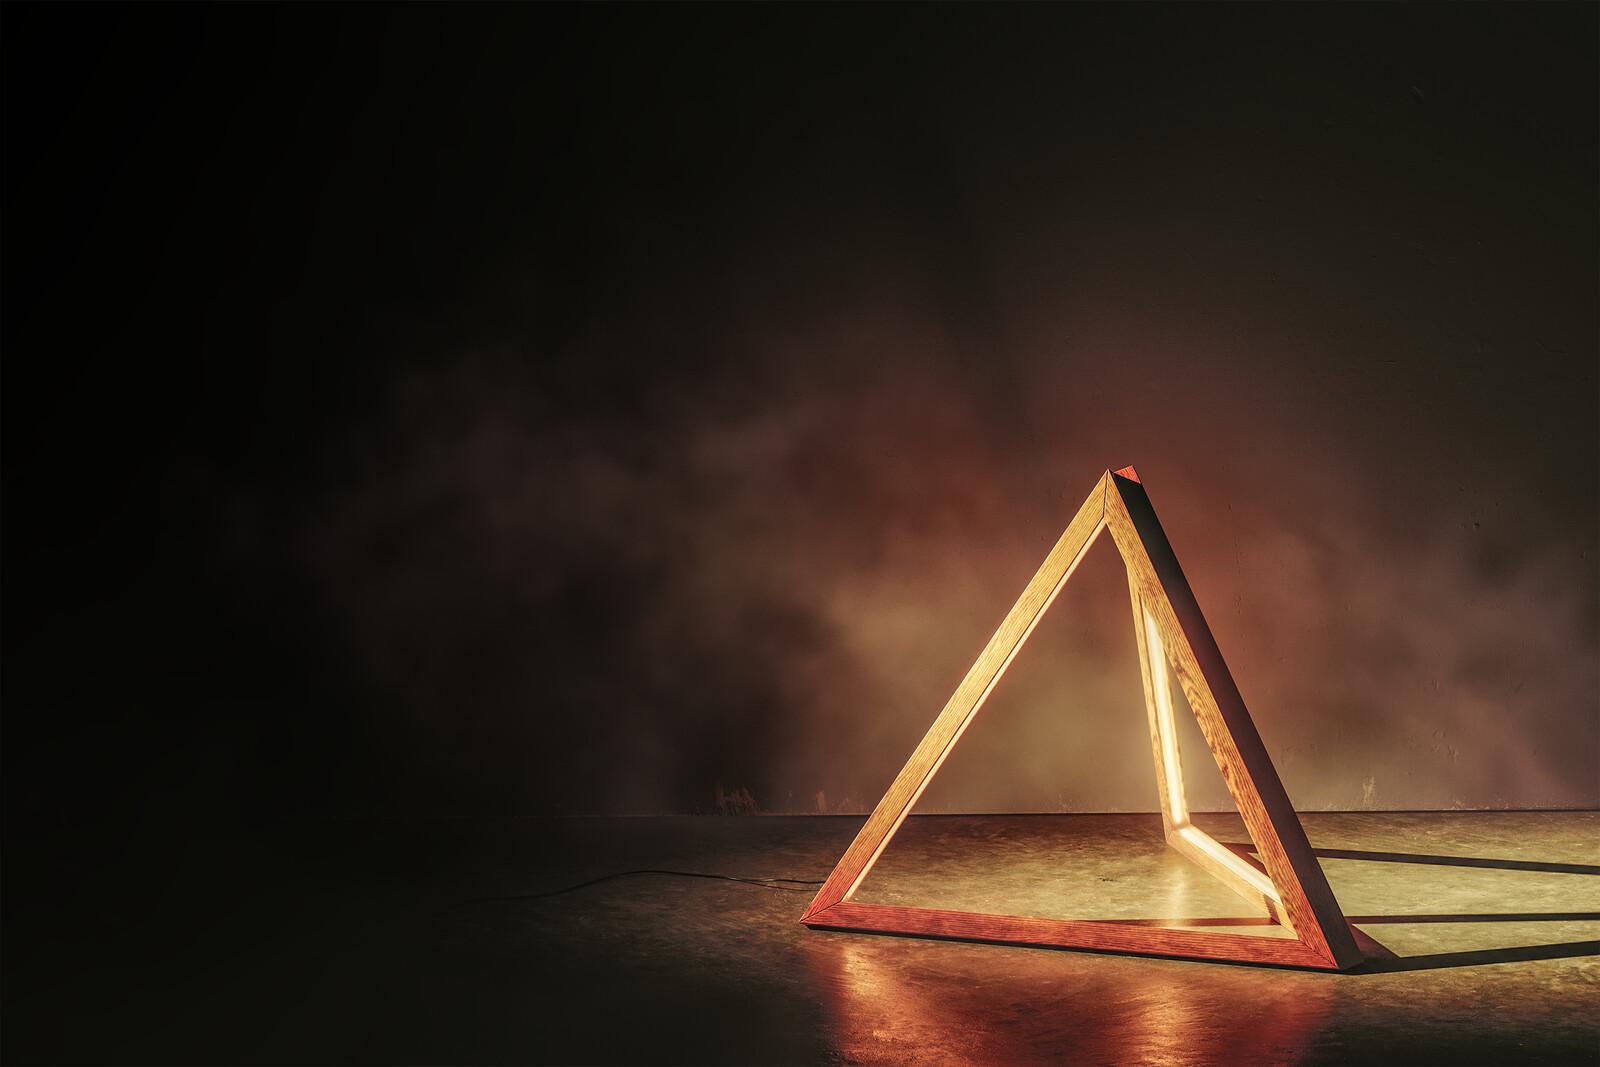 Tetra Light